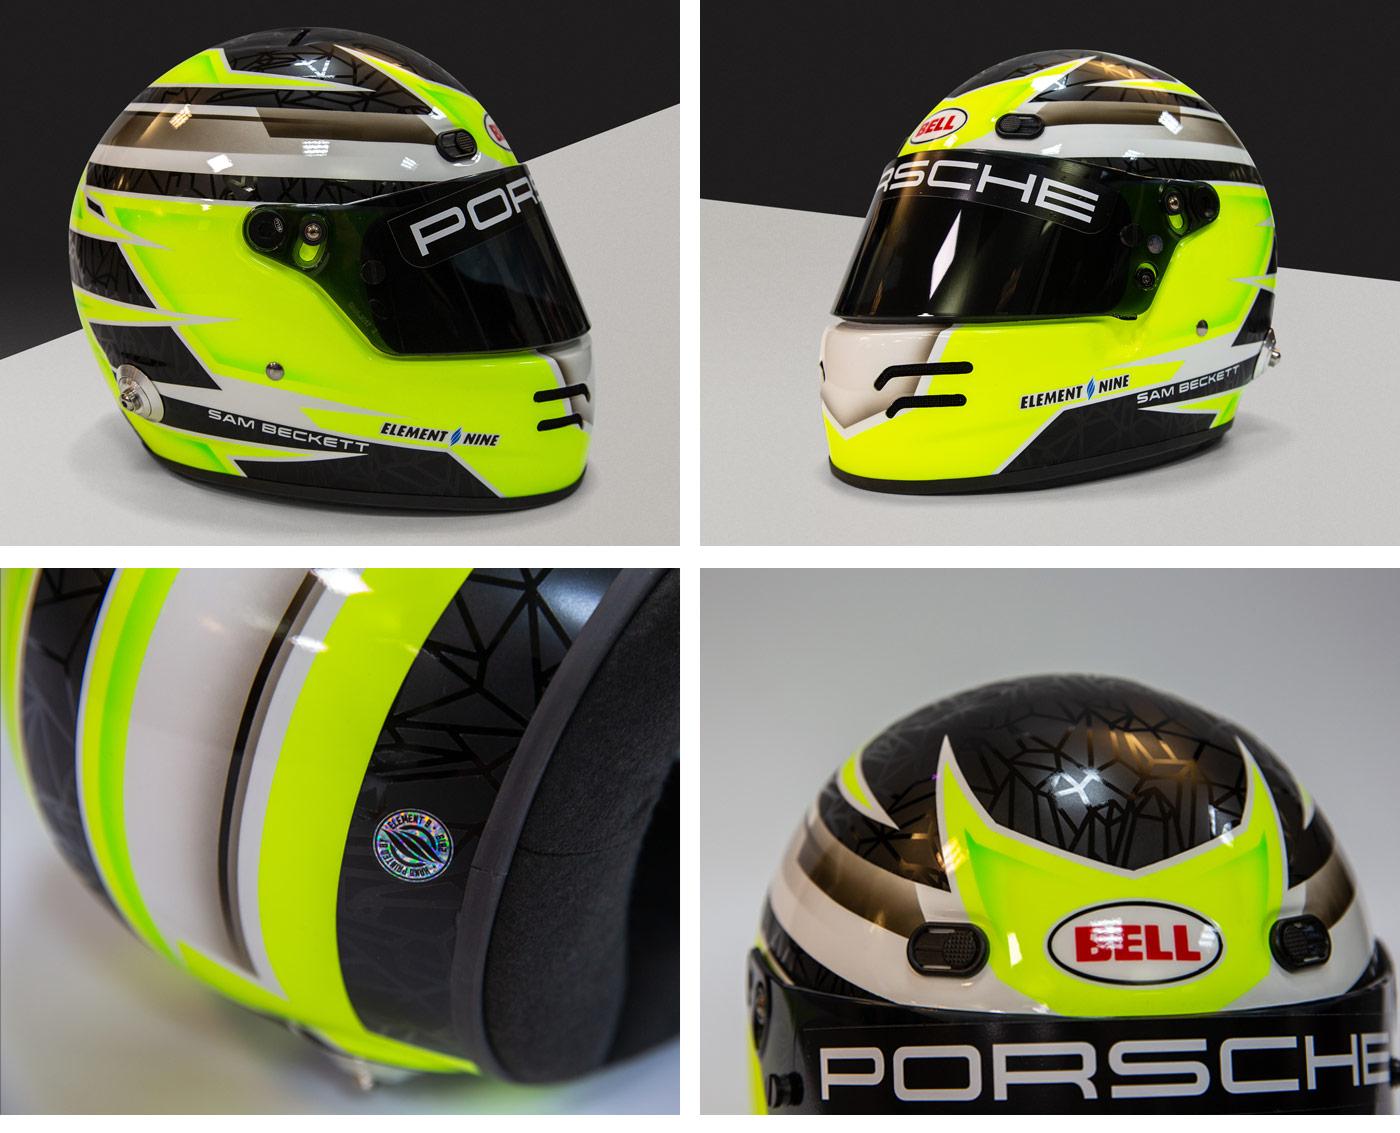 Sam-Beckett-Custom-painted-Bell-helmet